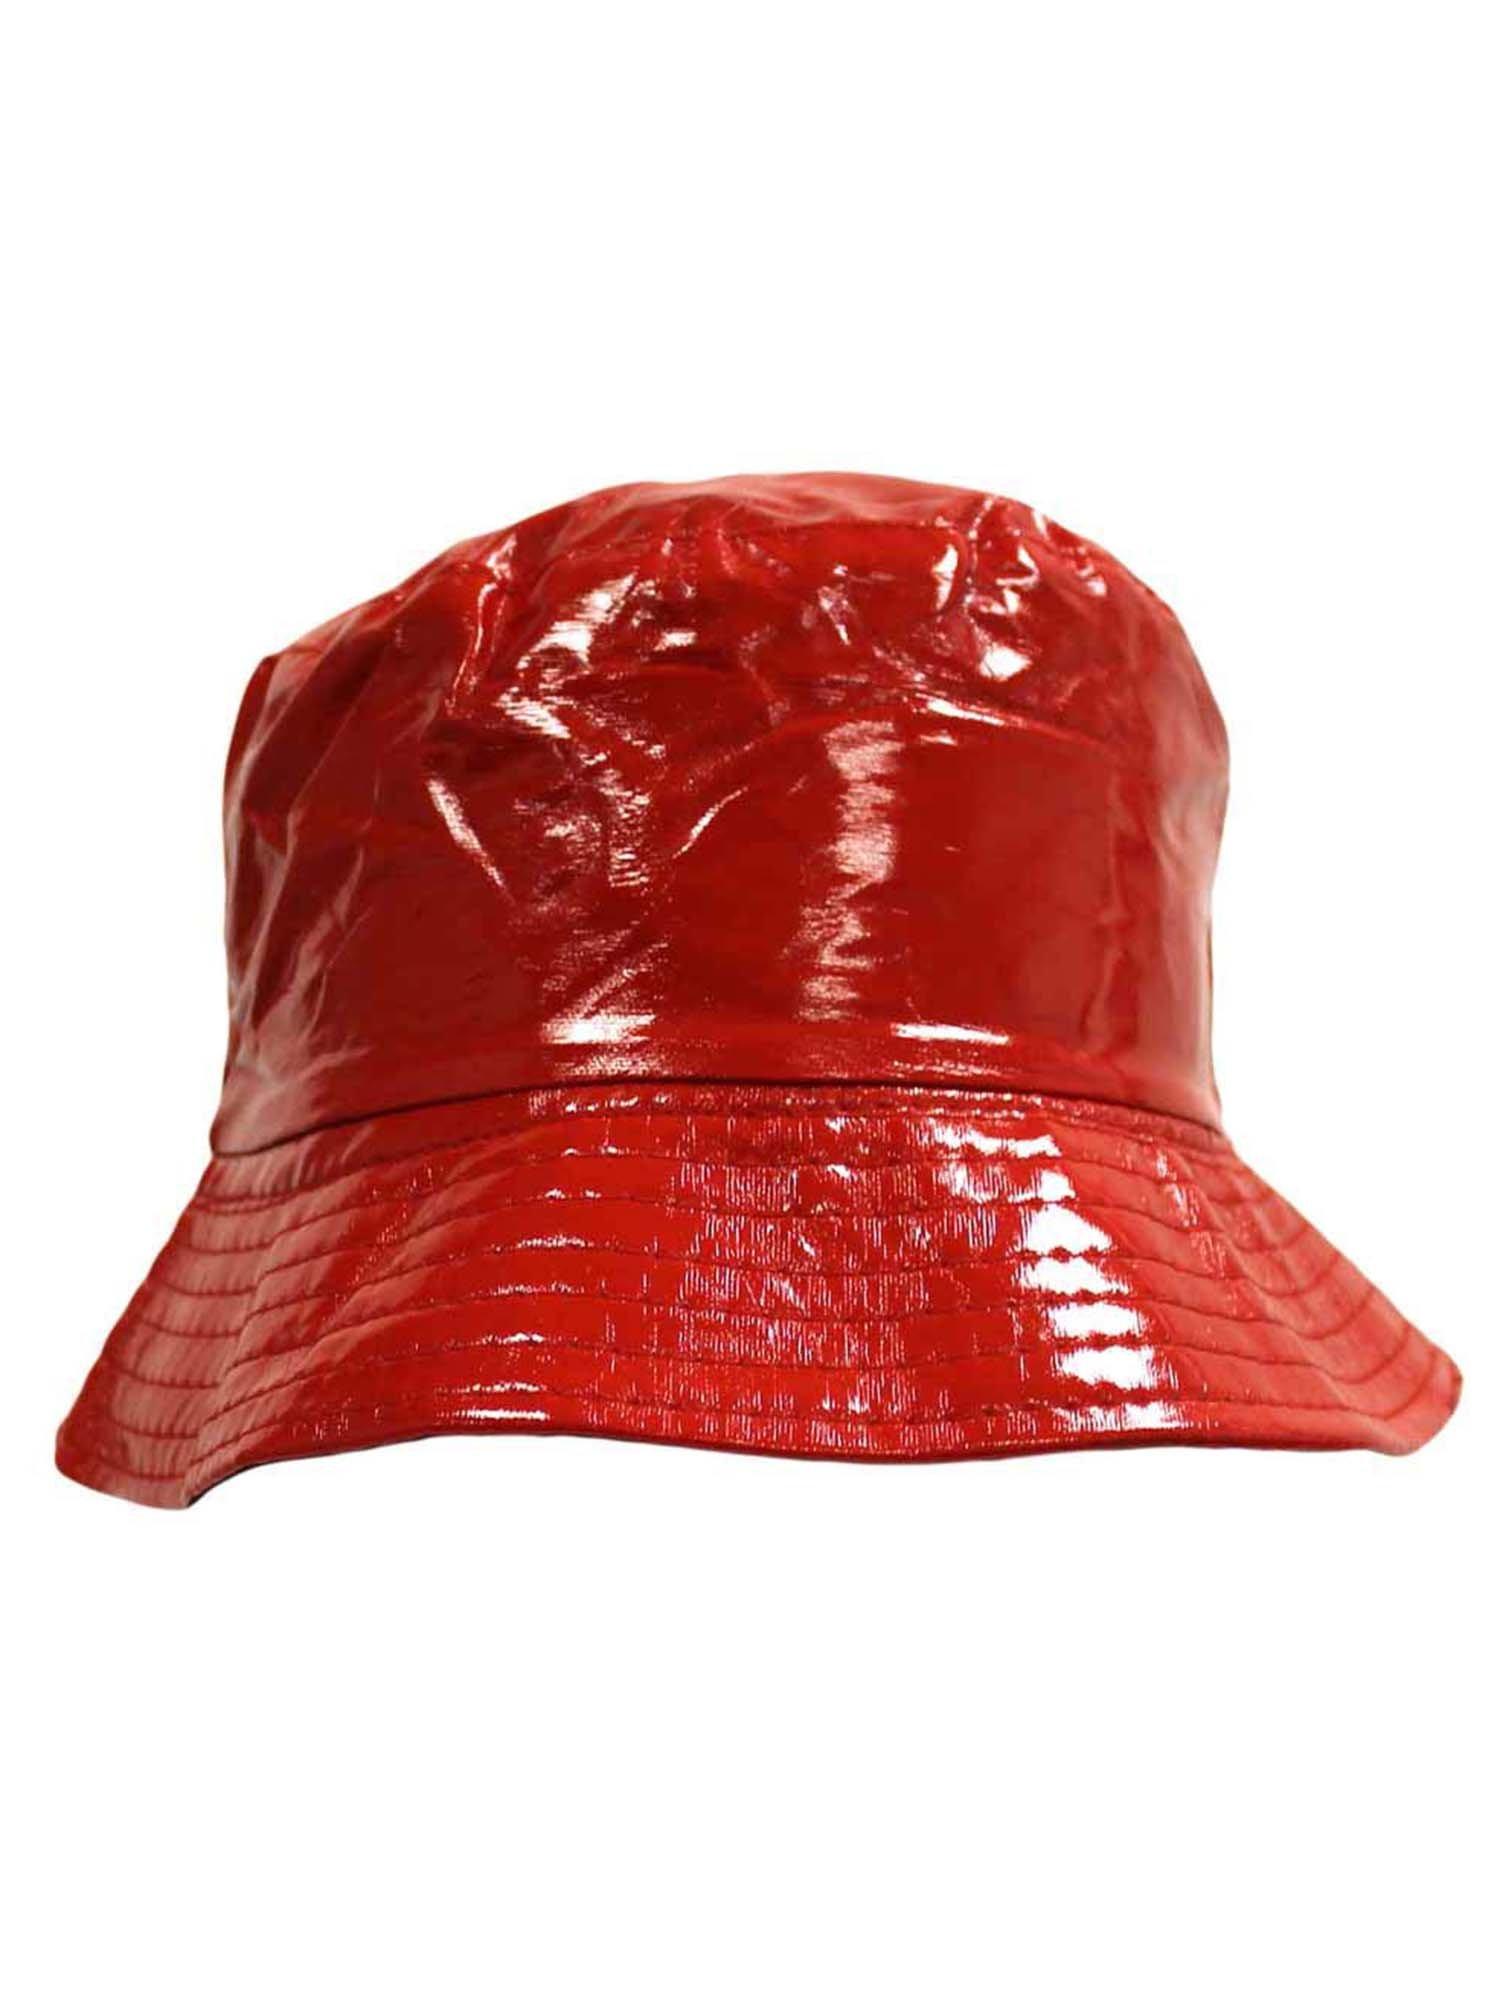 Luxury Divas Red Crushable Bucket Style Rain Hat